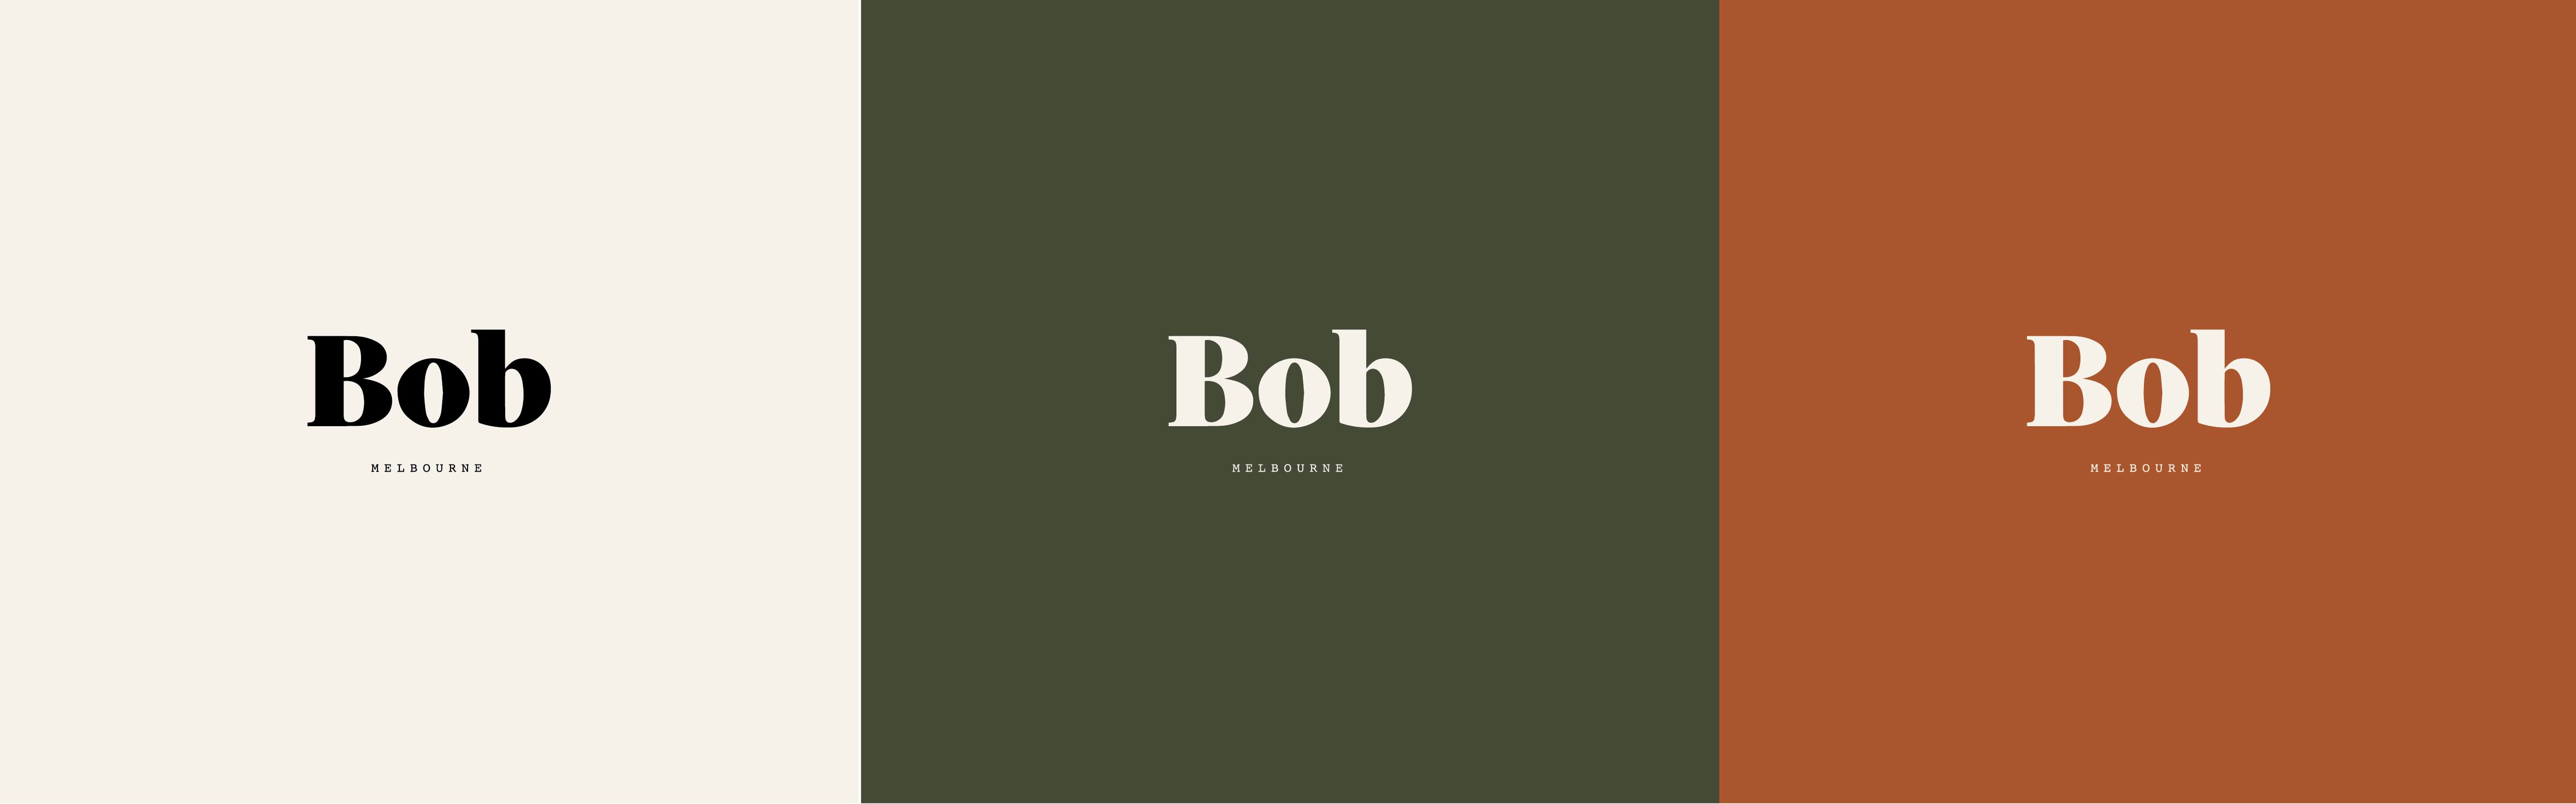 Nieuw Bob Melbourne - Nicole Miller-Wong LX-24